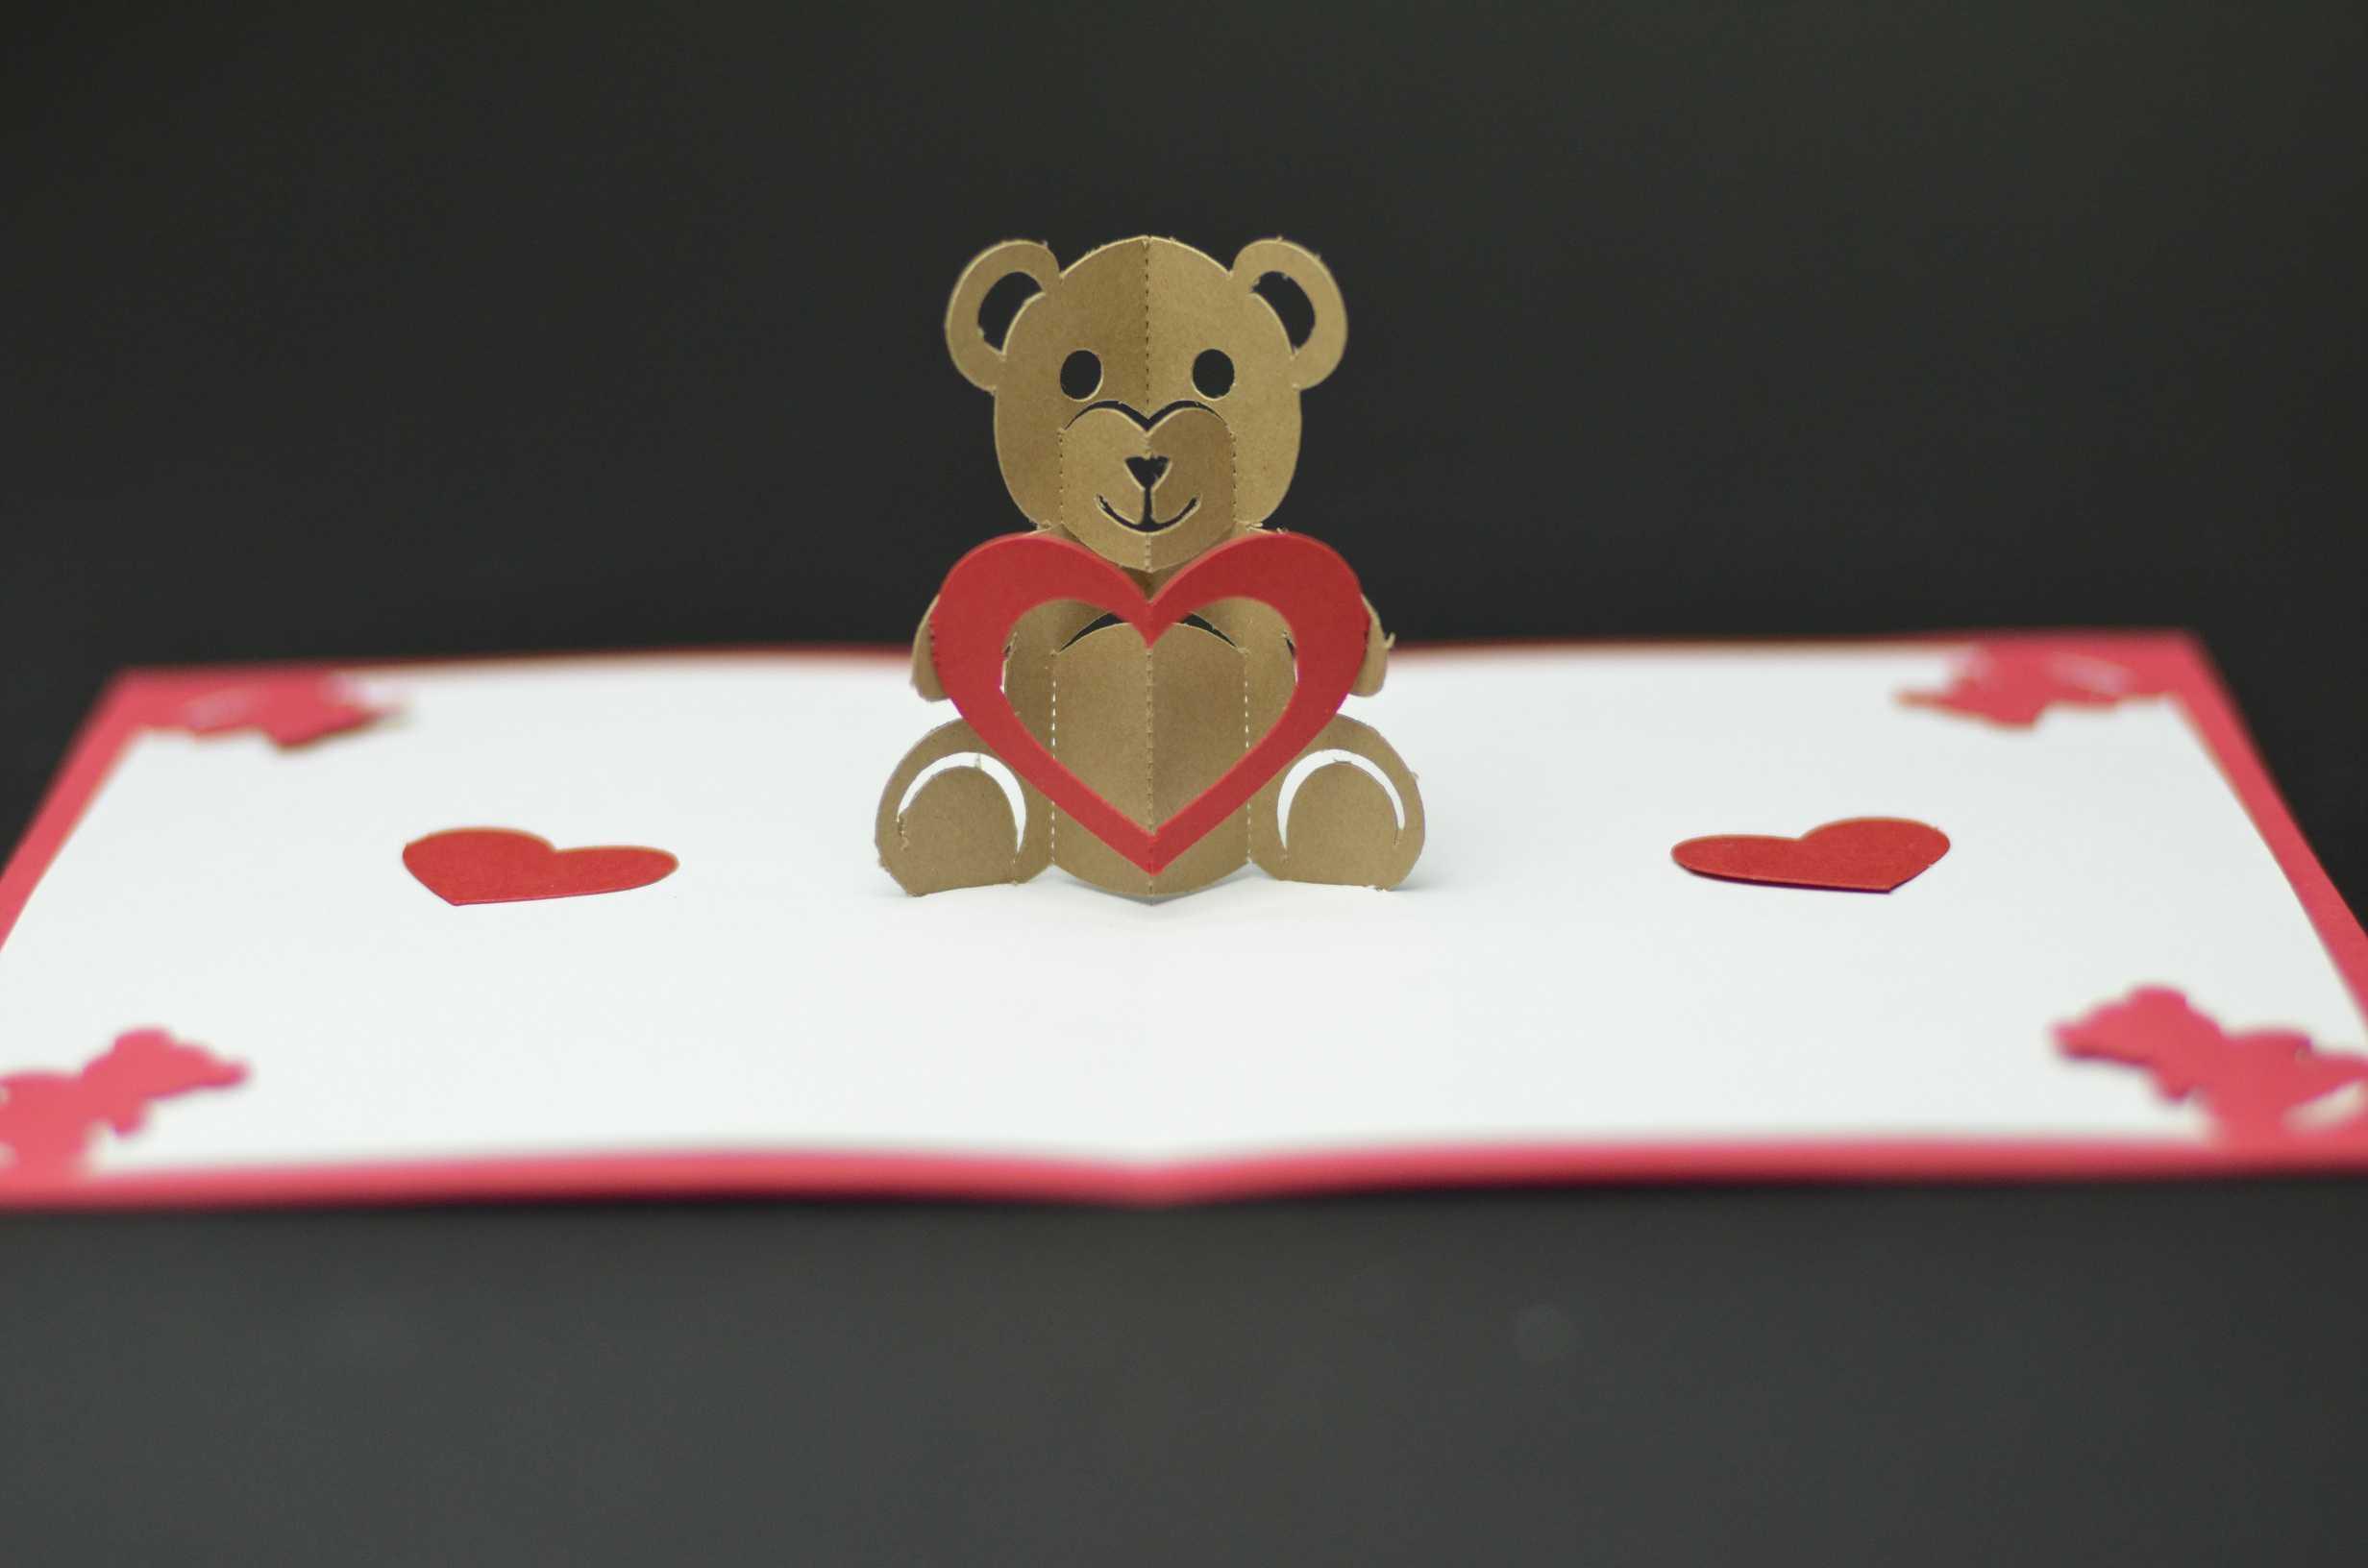 Pop Up Card Tutorials And Templates - Creative Pop Up Cards Pertaining To Popup Card Template Free